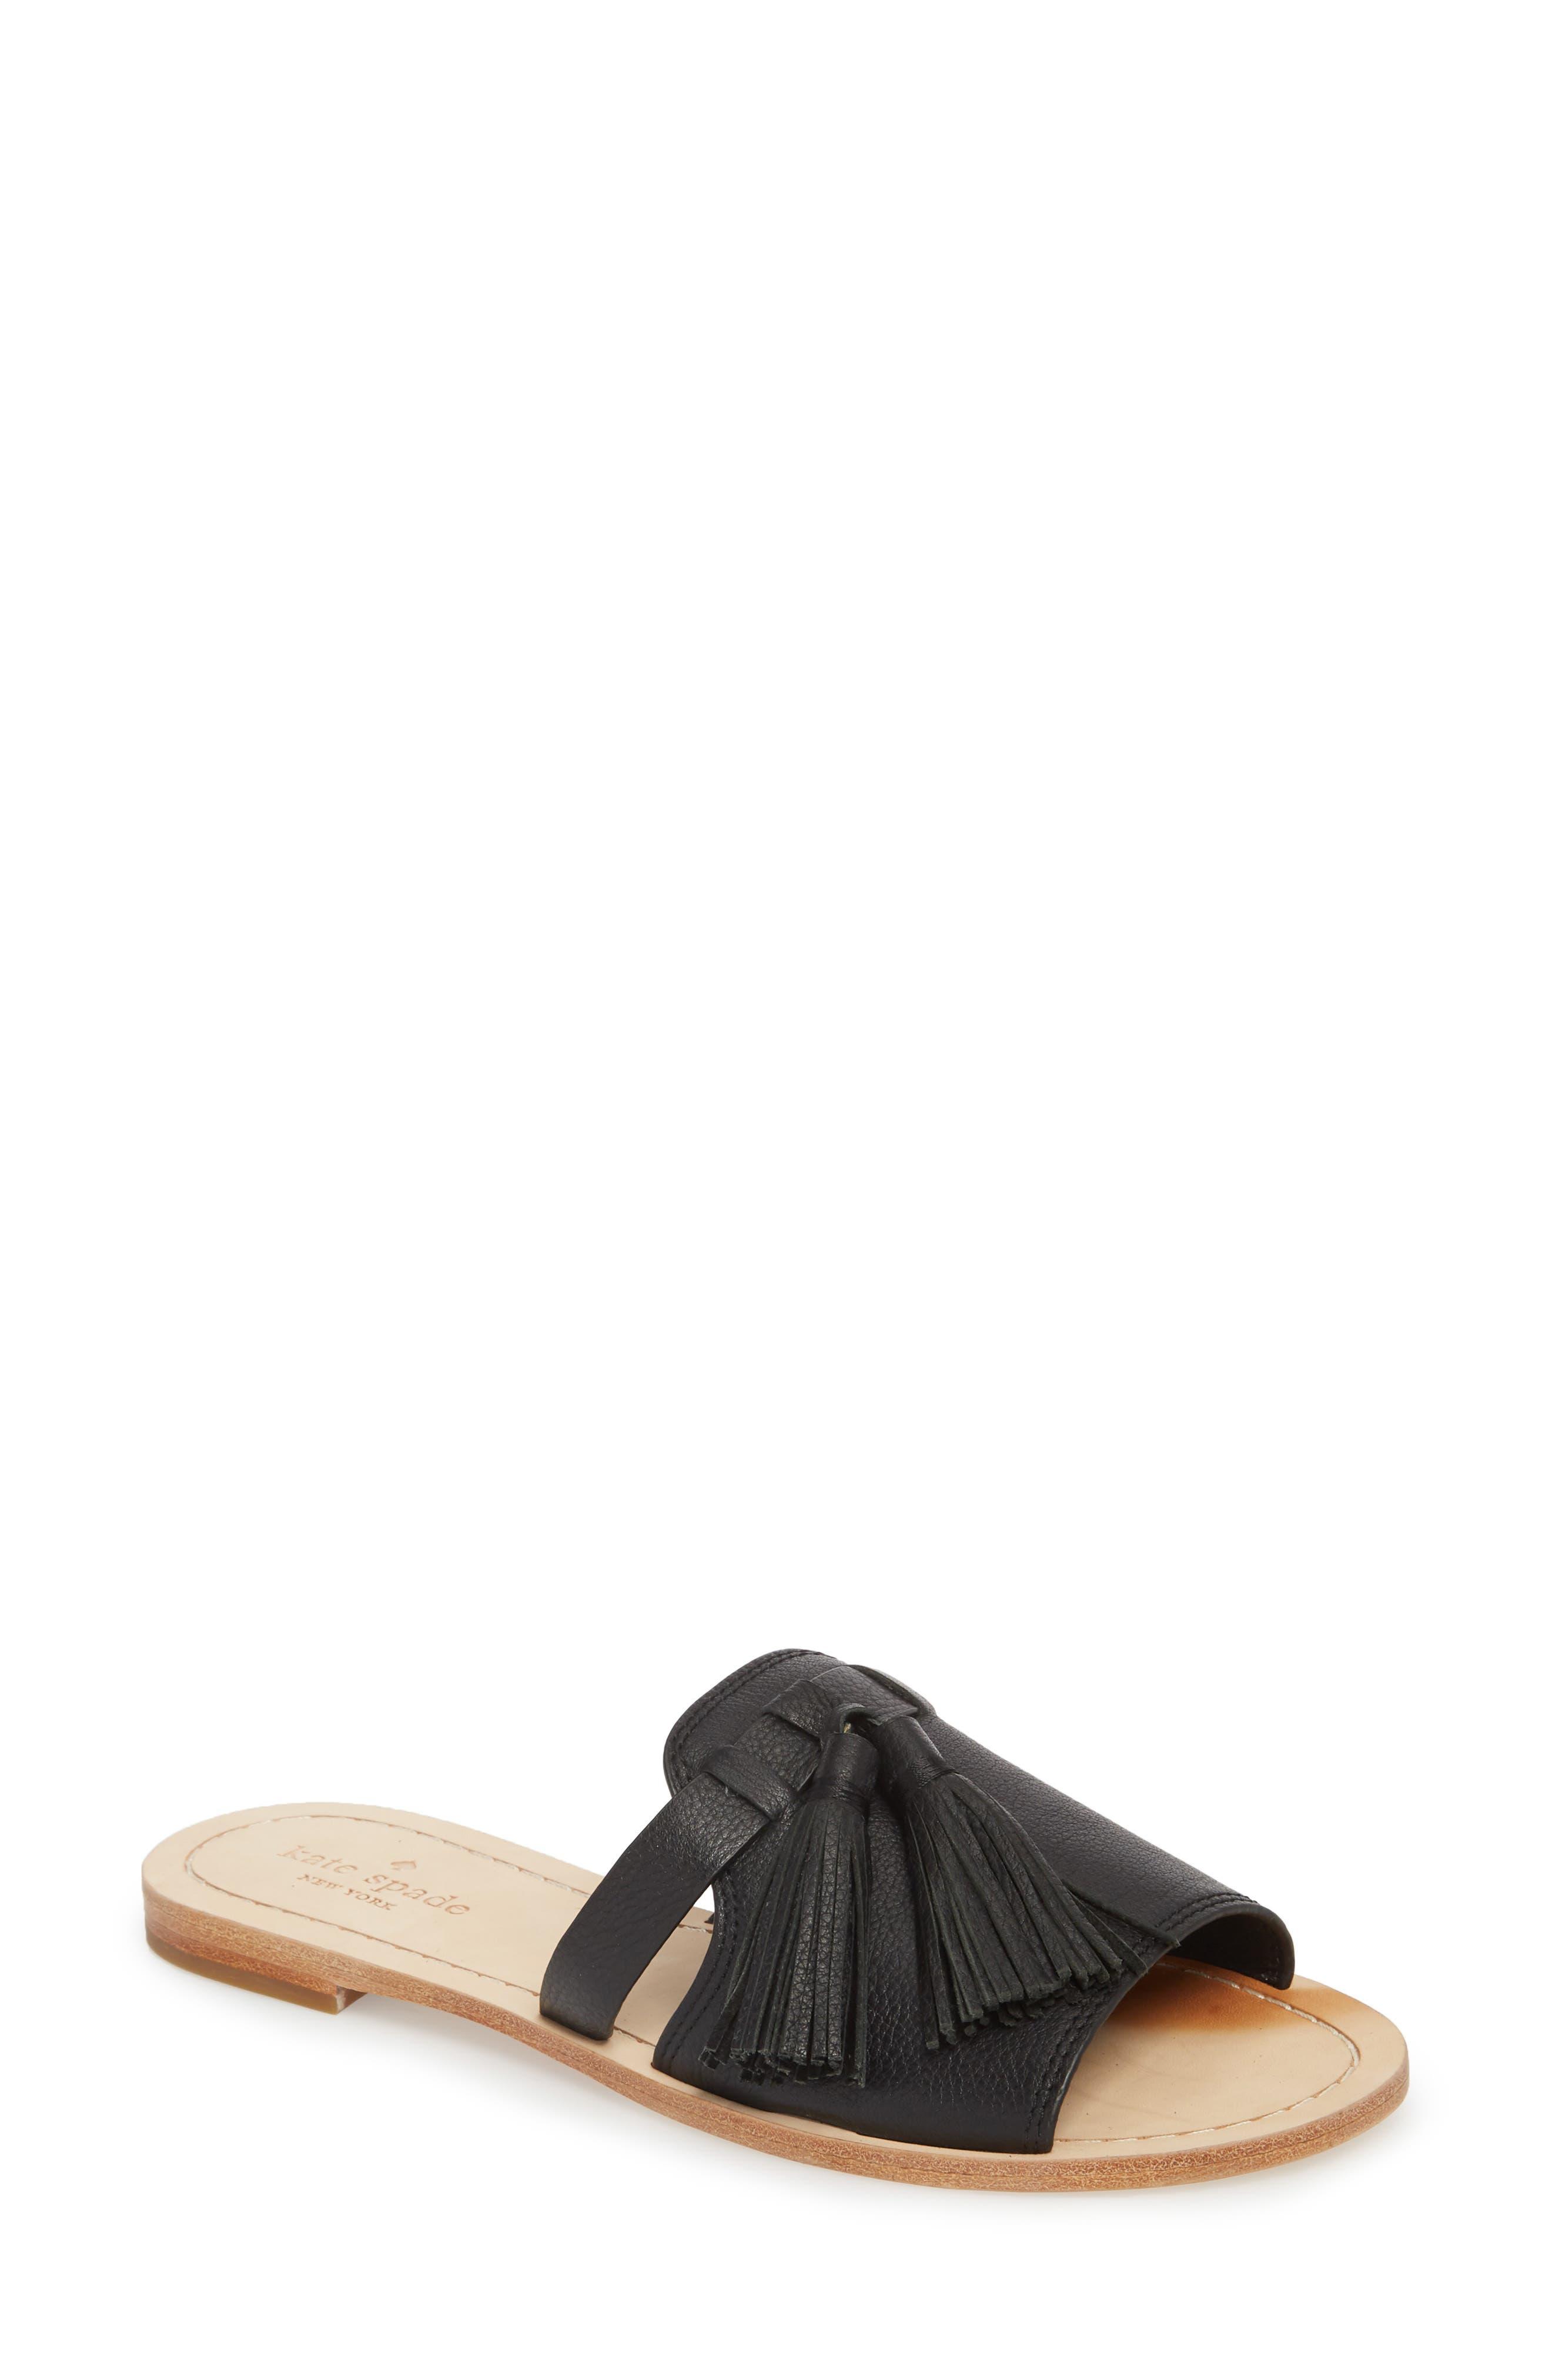 coby tassel slide sandal,                         Main,                         color, 001